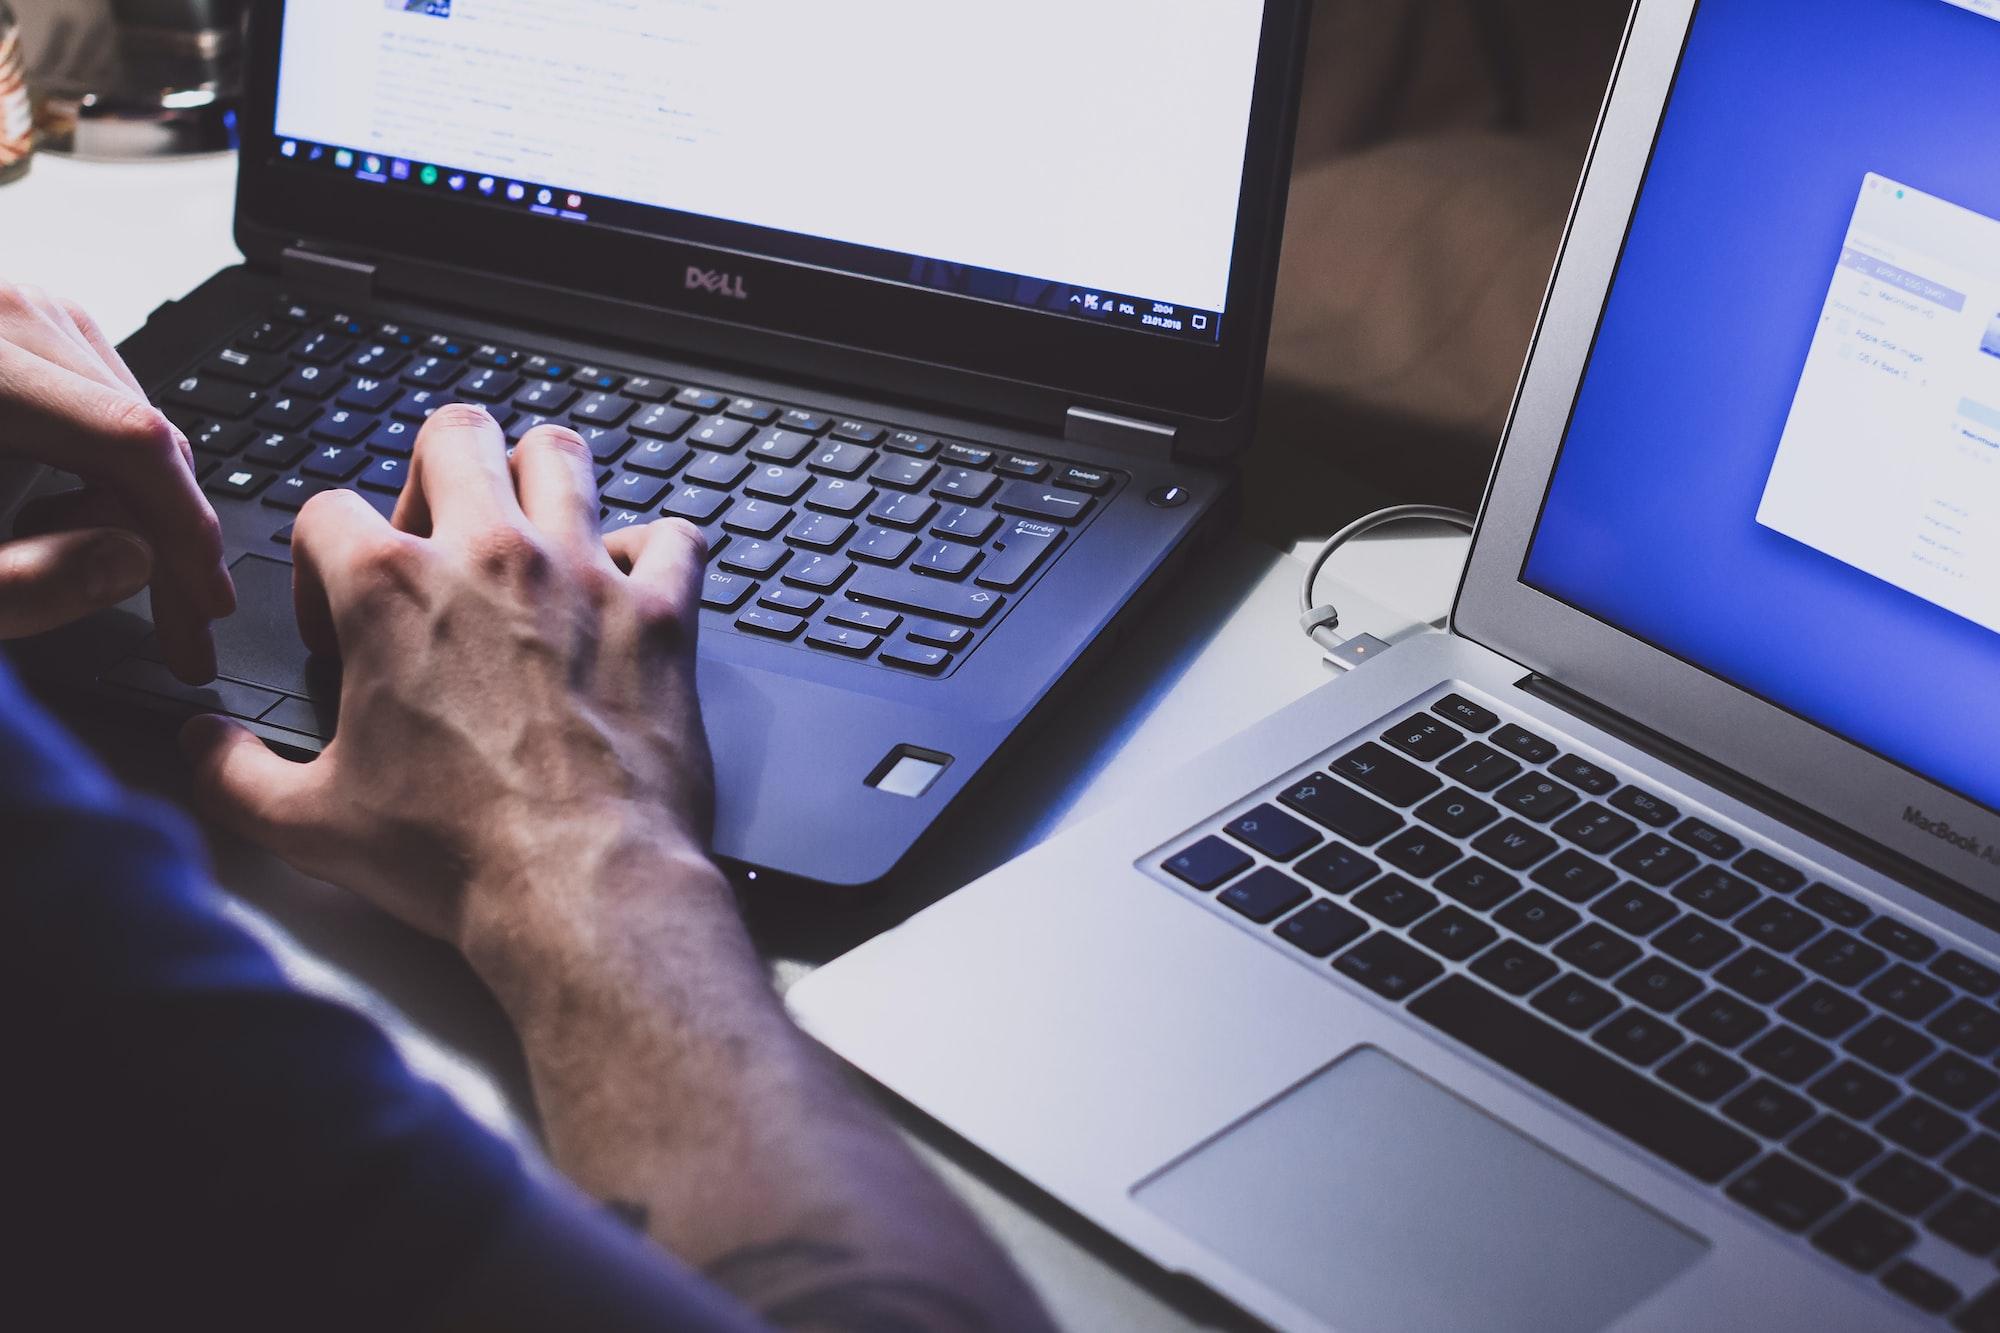 20+ Transcription Companies that Hire on a Regular Basis